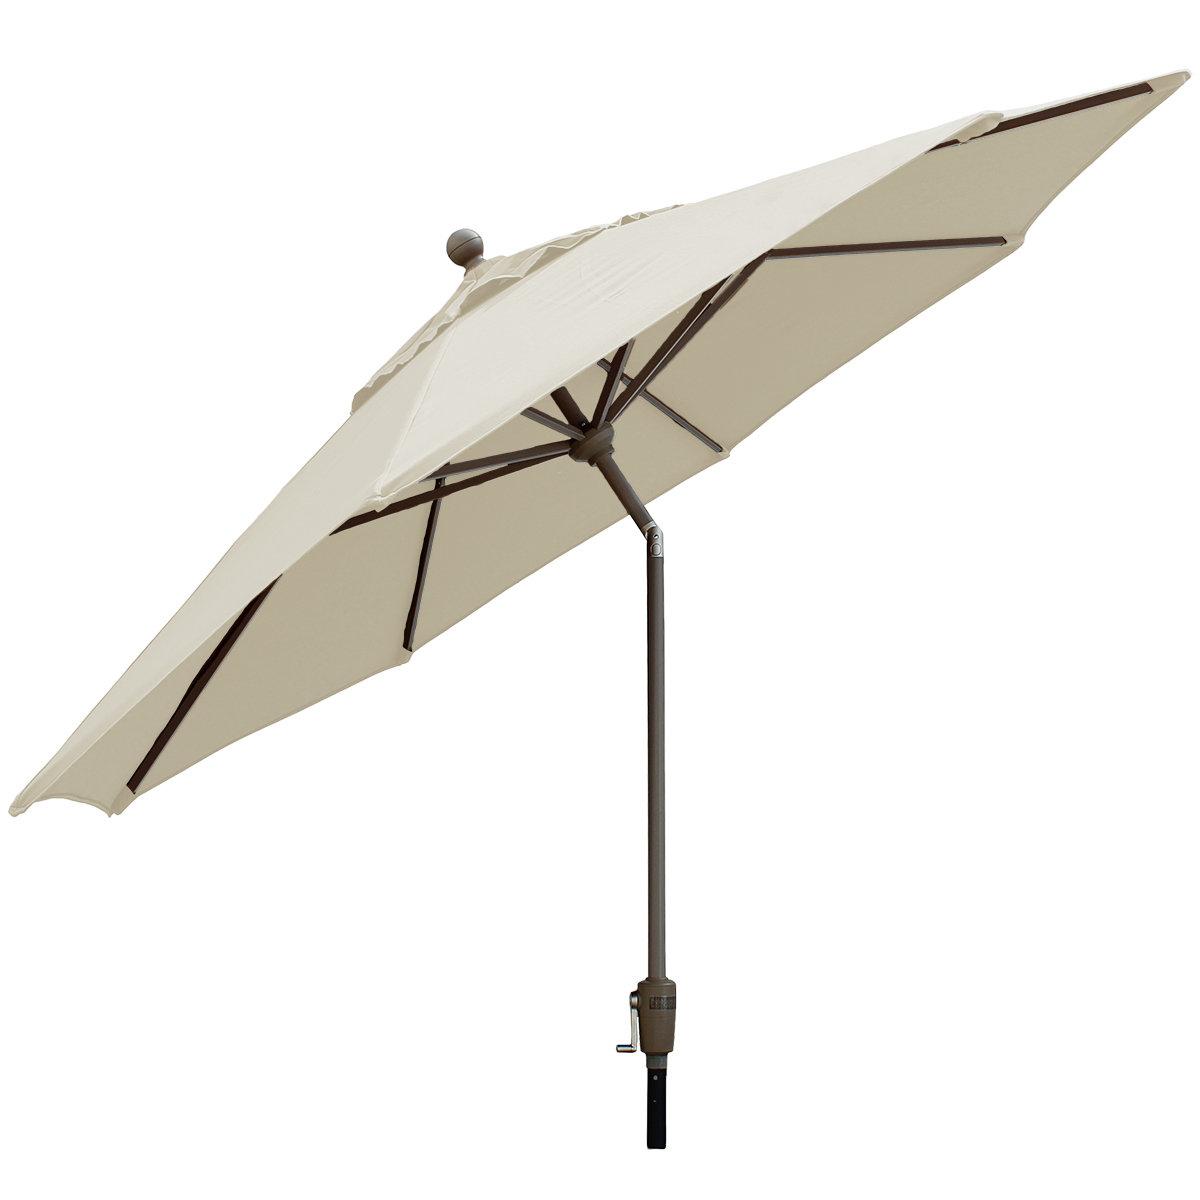 2019 Crowland 9' Market Sunbrella Umbrella Within Mullaney Market Sunbrella Umbrellas (Gallery 19 of 20)